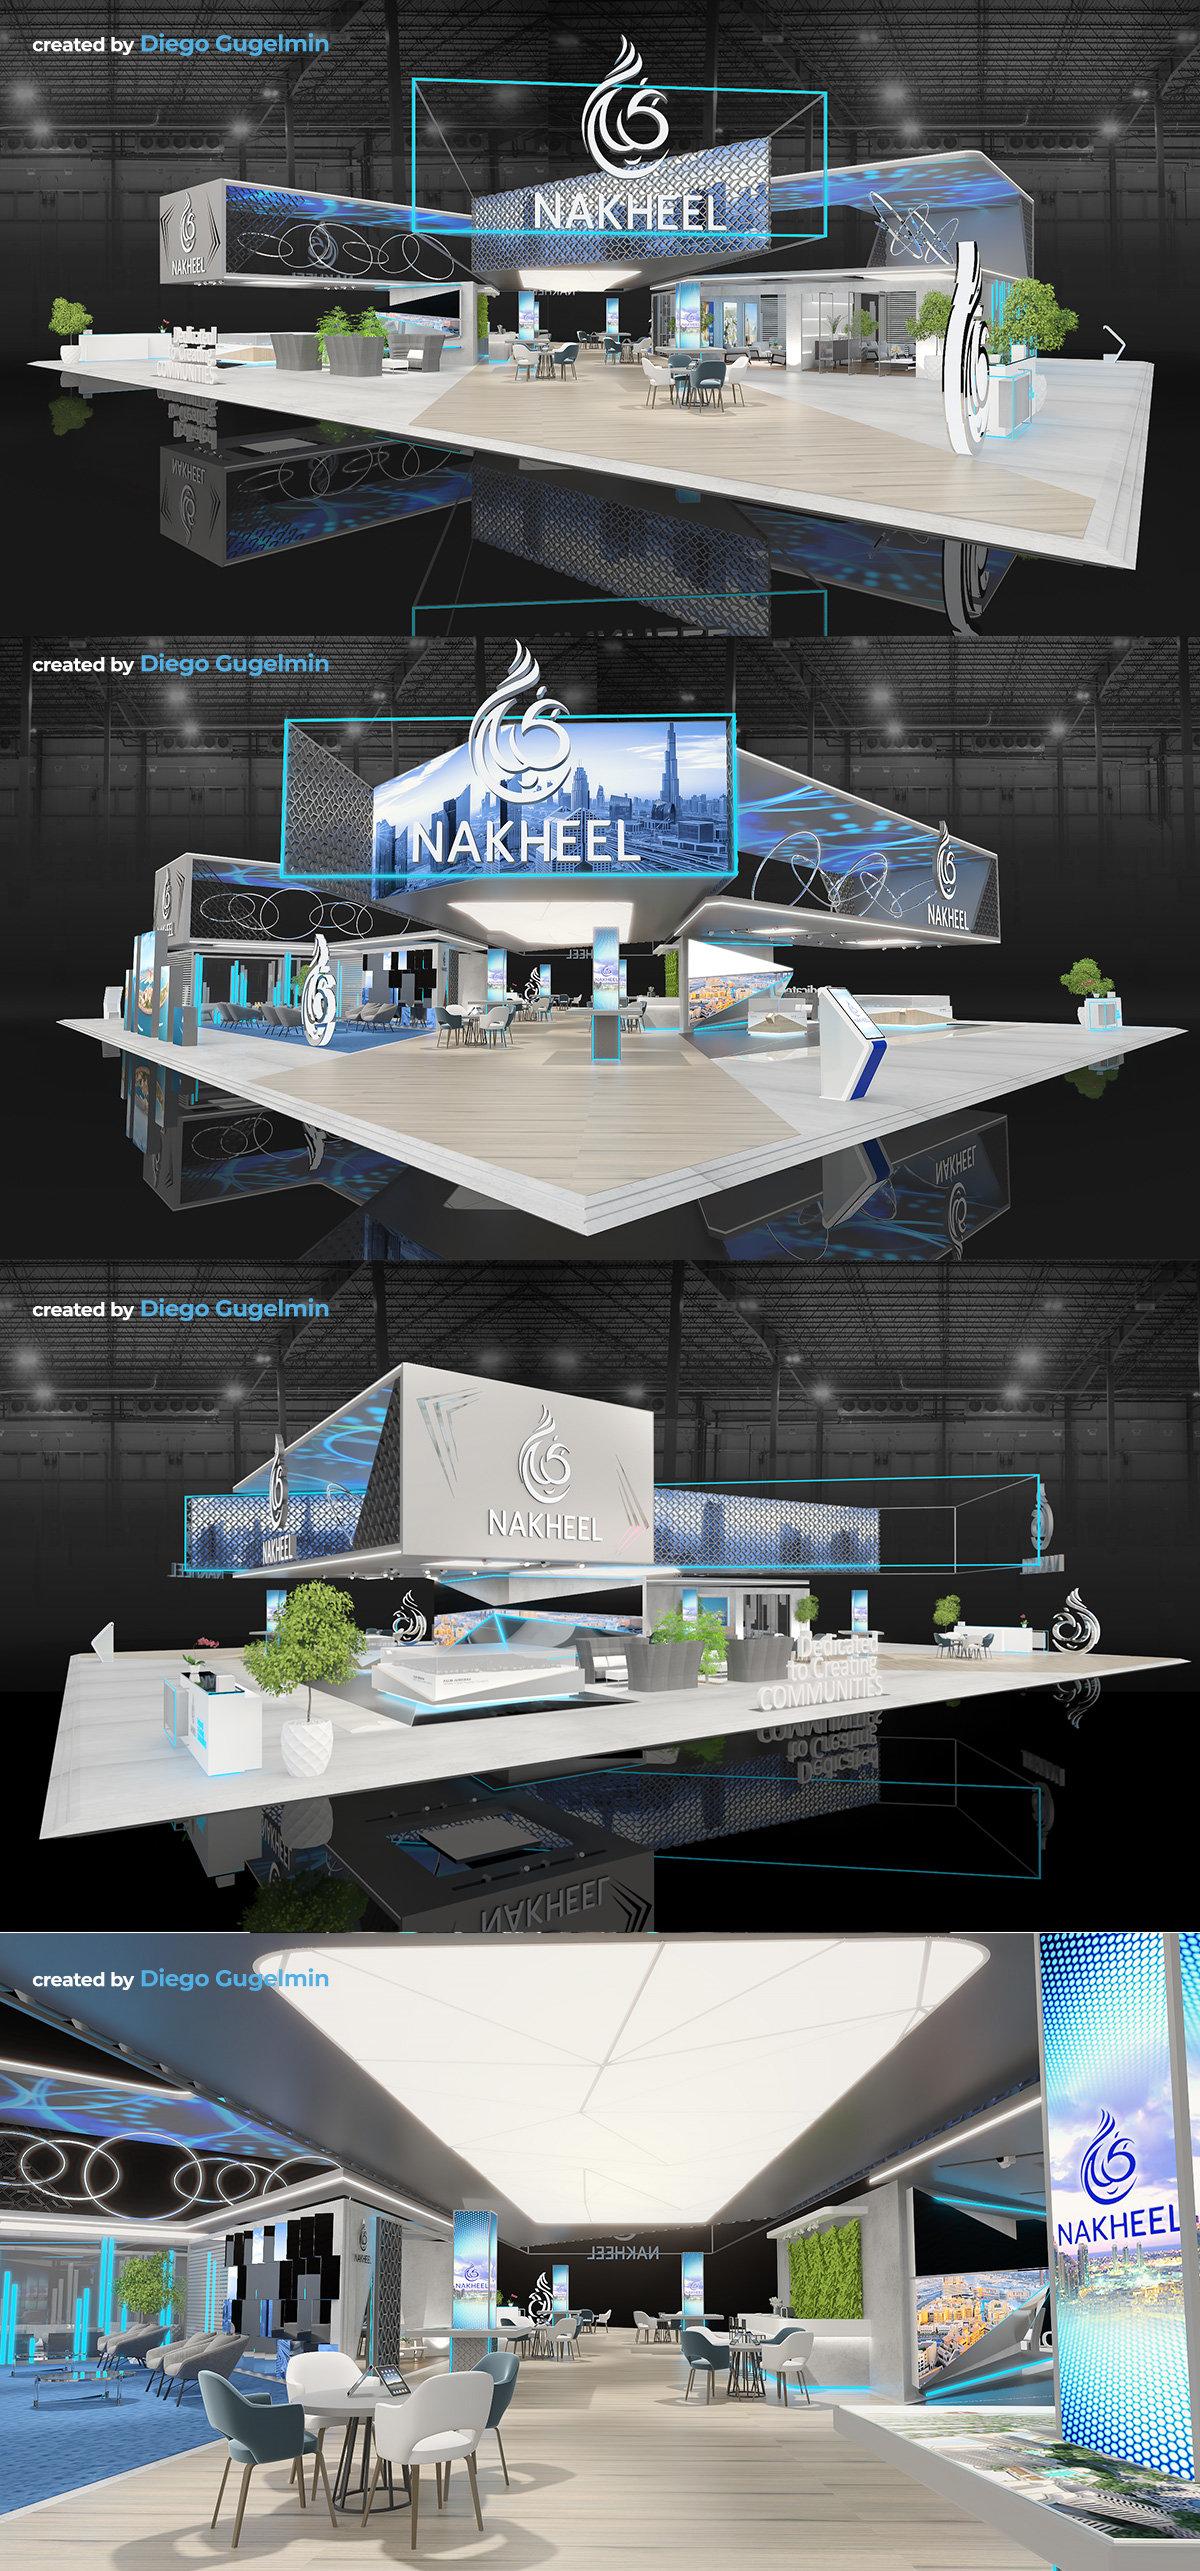 D Exhibition Stall Designer Jobs In Dubai : Exhibition design by diego gugelmin at coroflot